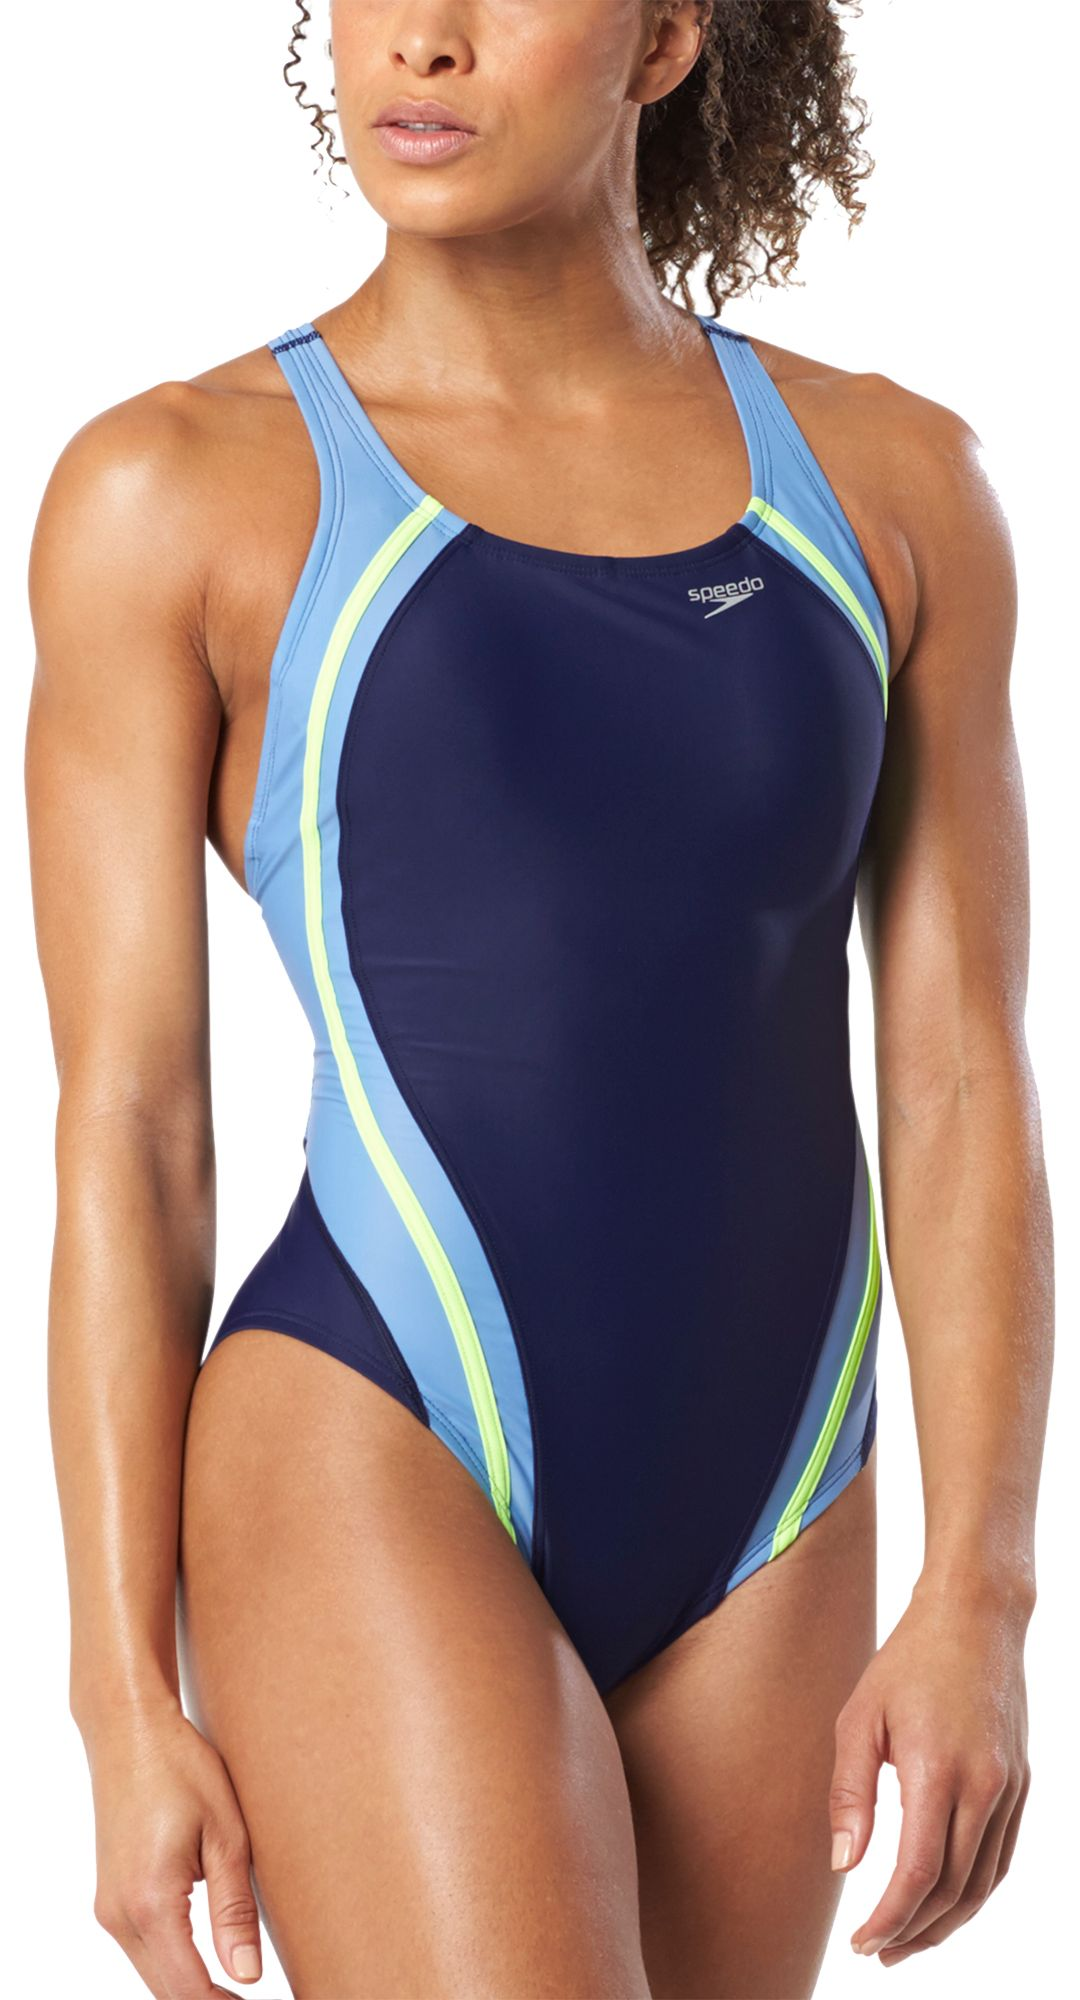 c8a365be1be01 Speedo Women's PowerFLEX Eco Quantum Splice One Piece Swimsuit.  noImageFound. Previous